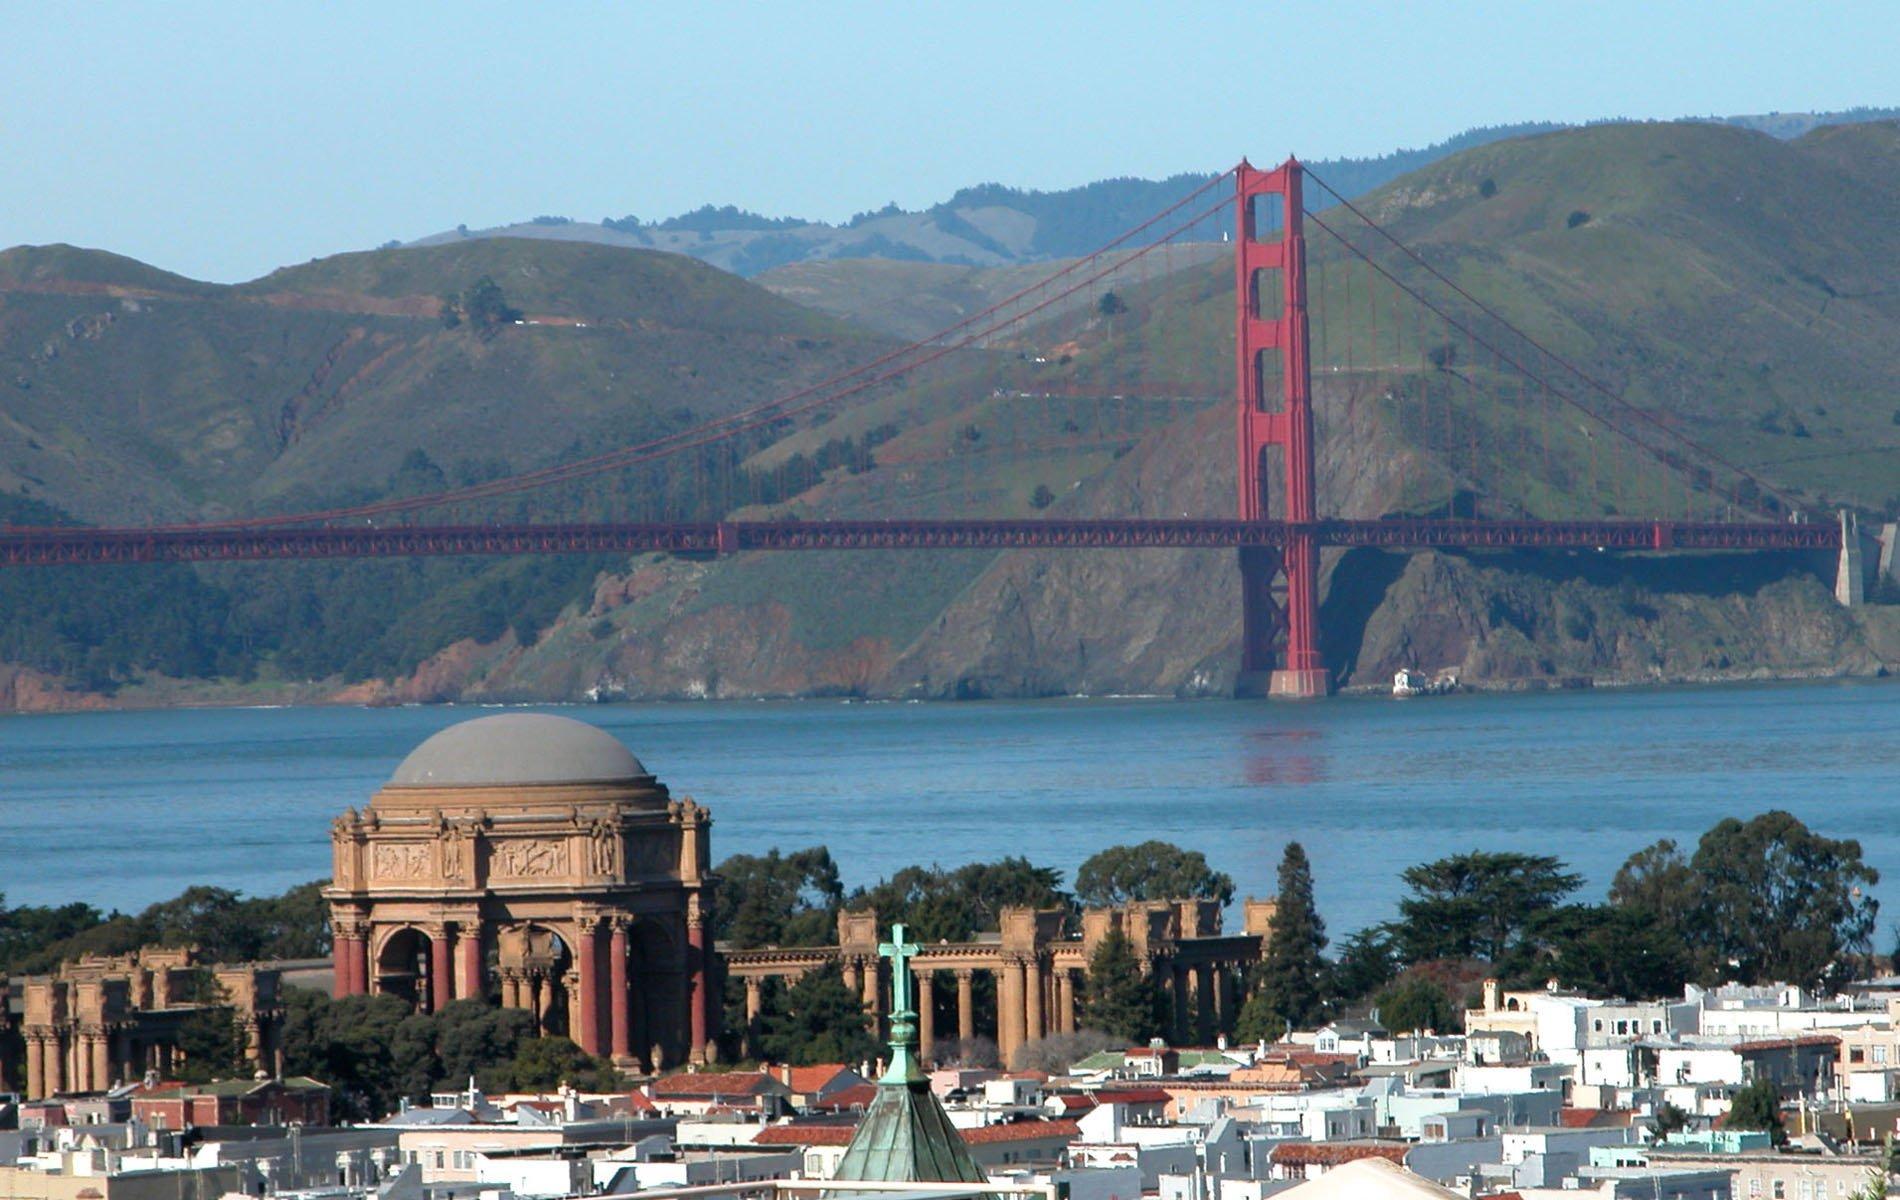 San Francisco Desktop Wallpaper 1900x1200